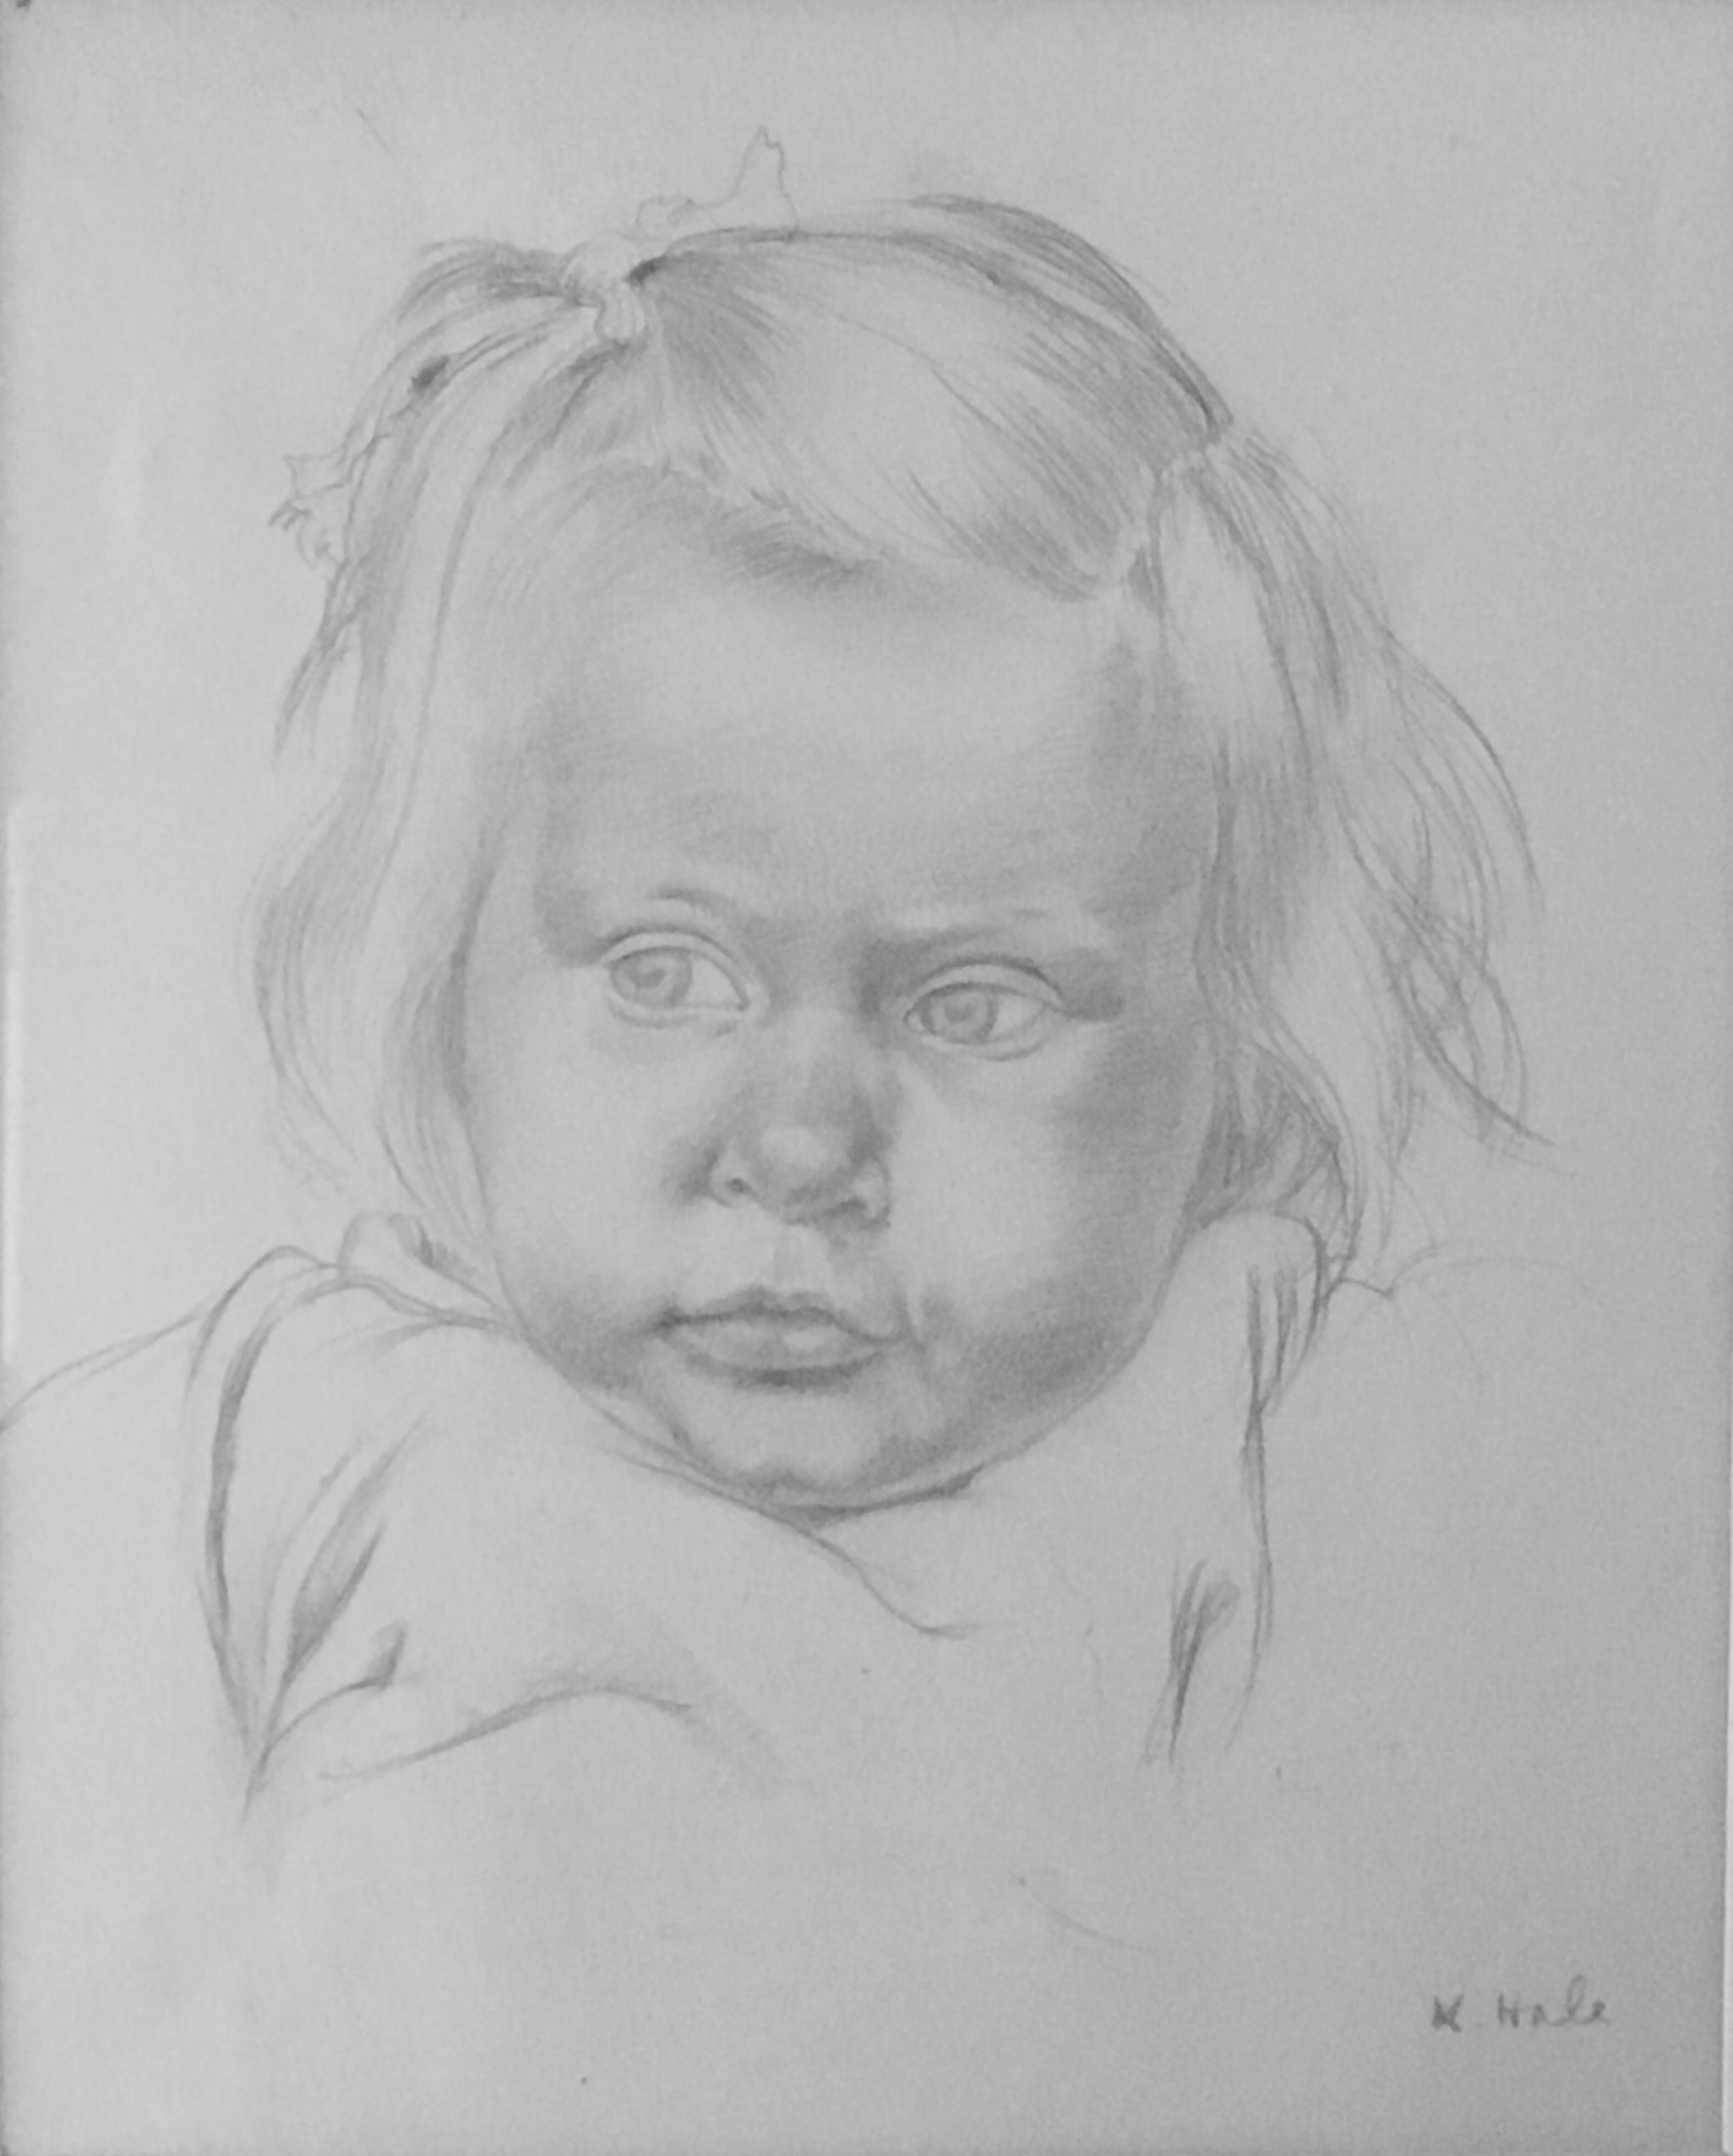 Little girl pencil drawing c 1920 kathleen hale c b e 1898 2000